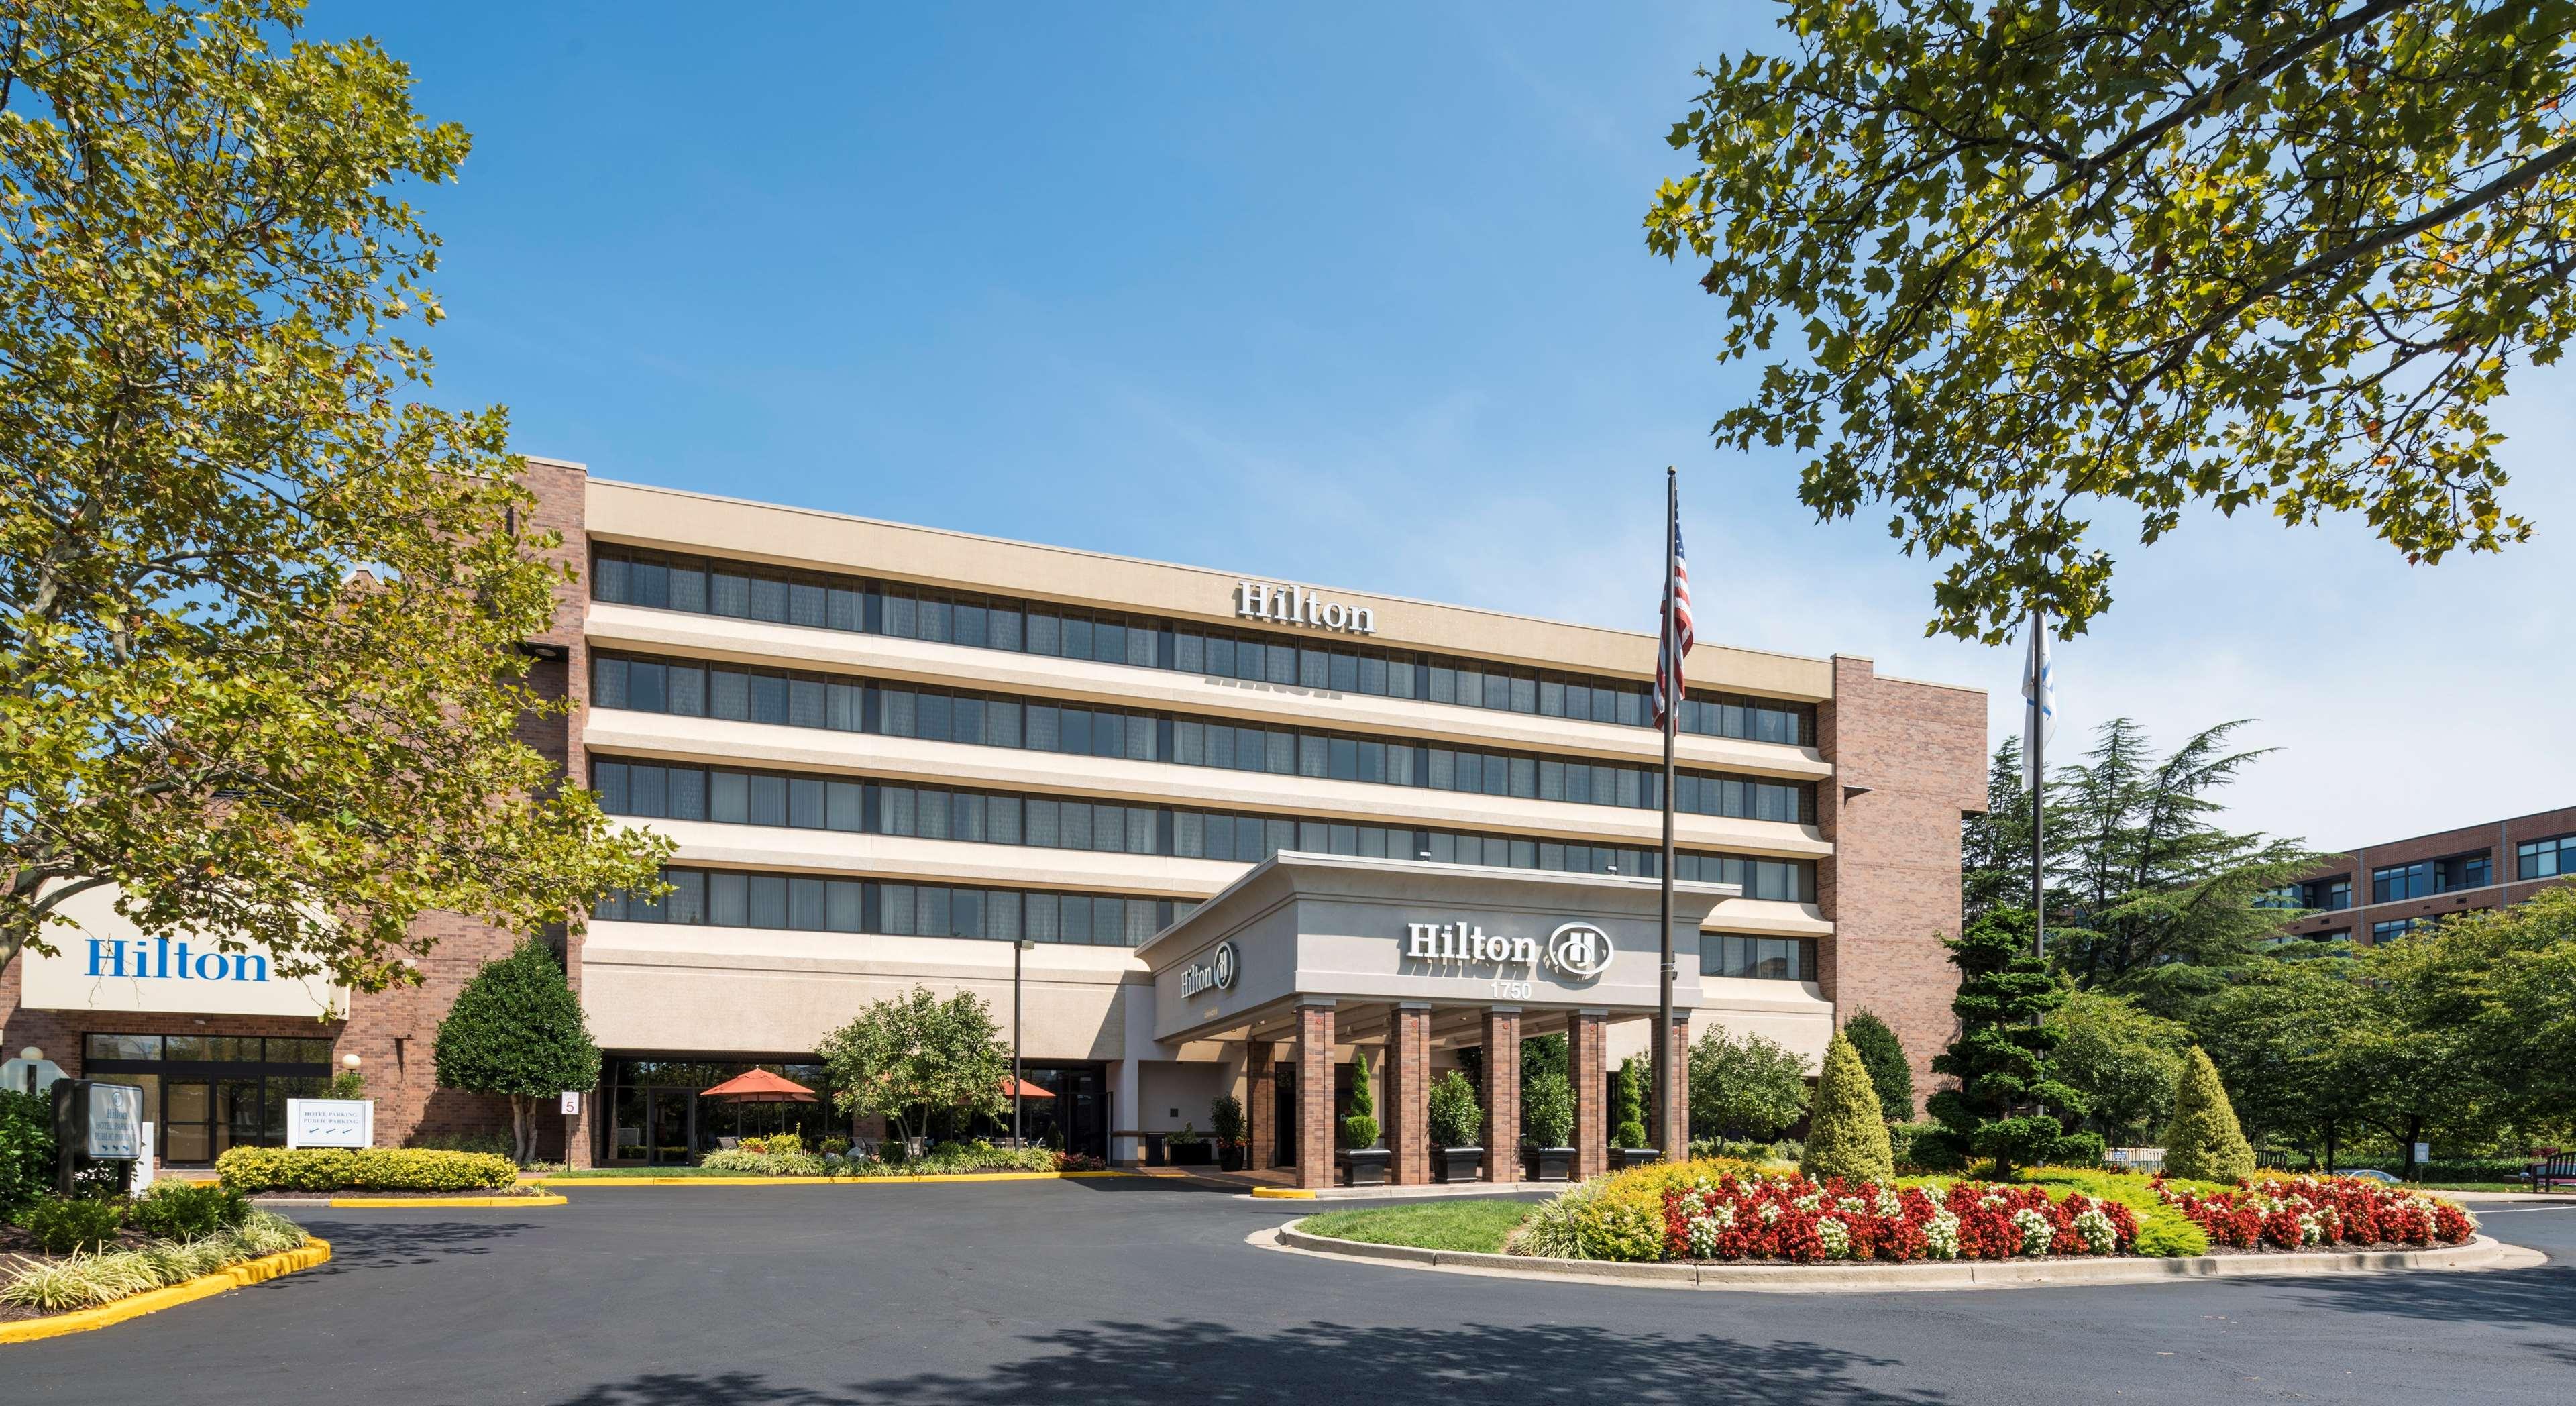 Hilton Washington DC/Rockville Hotel & Executive Meeting Ctr image 4